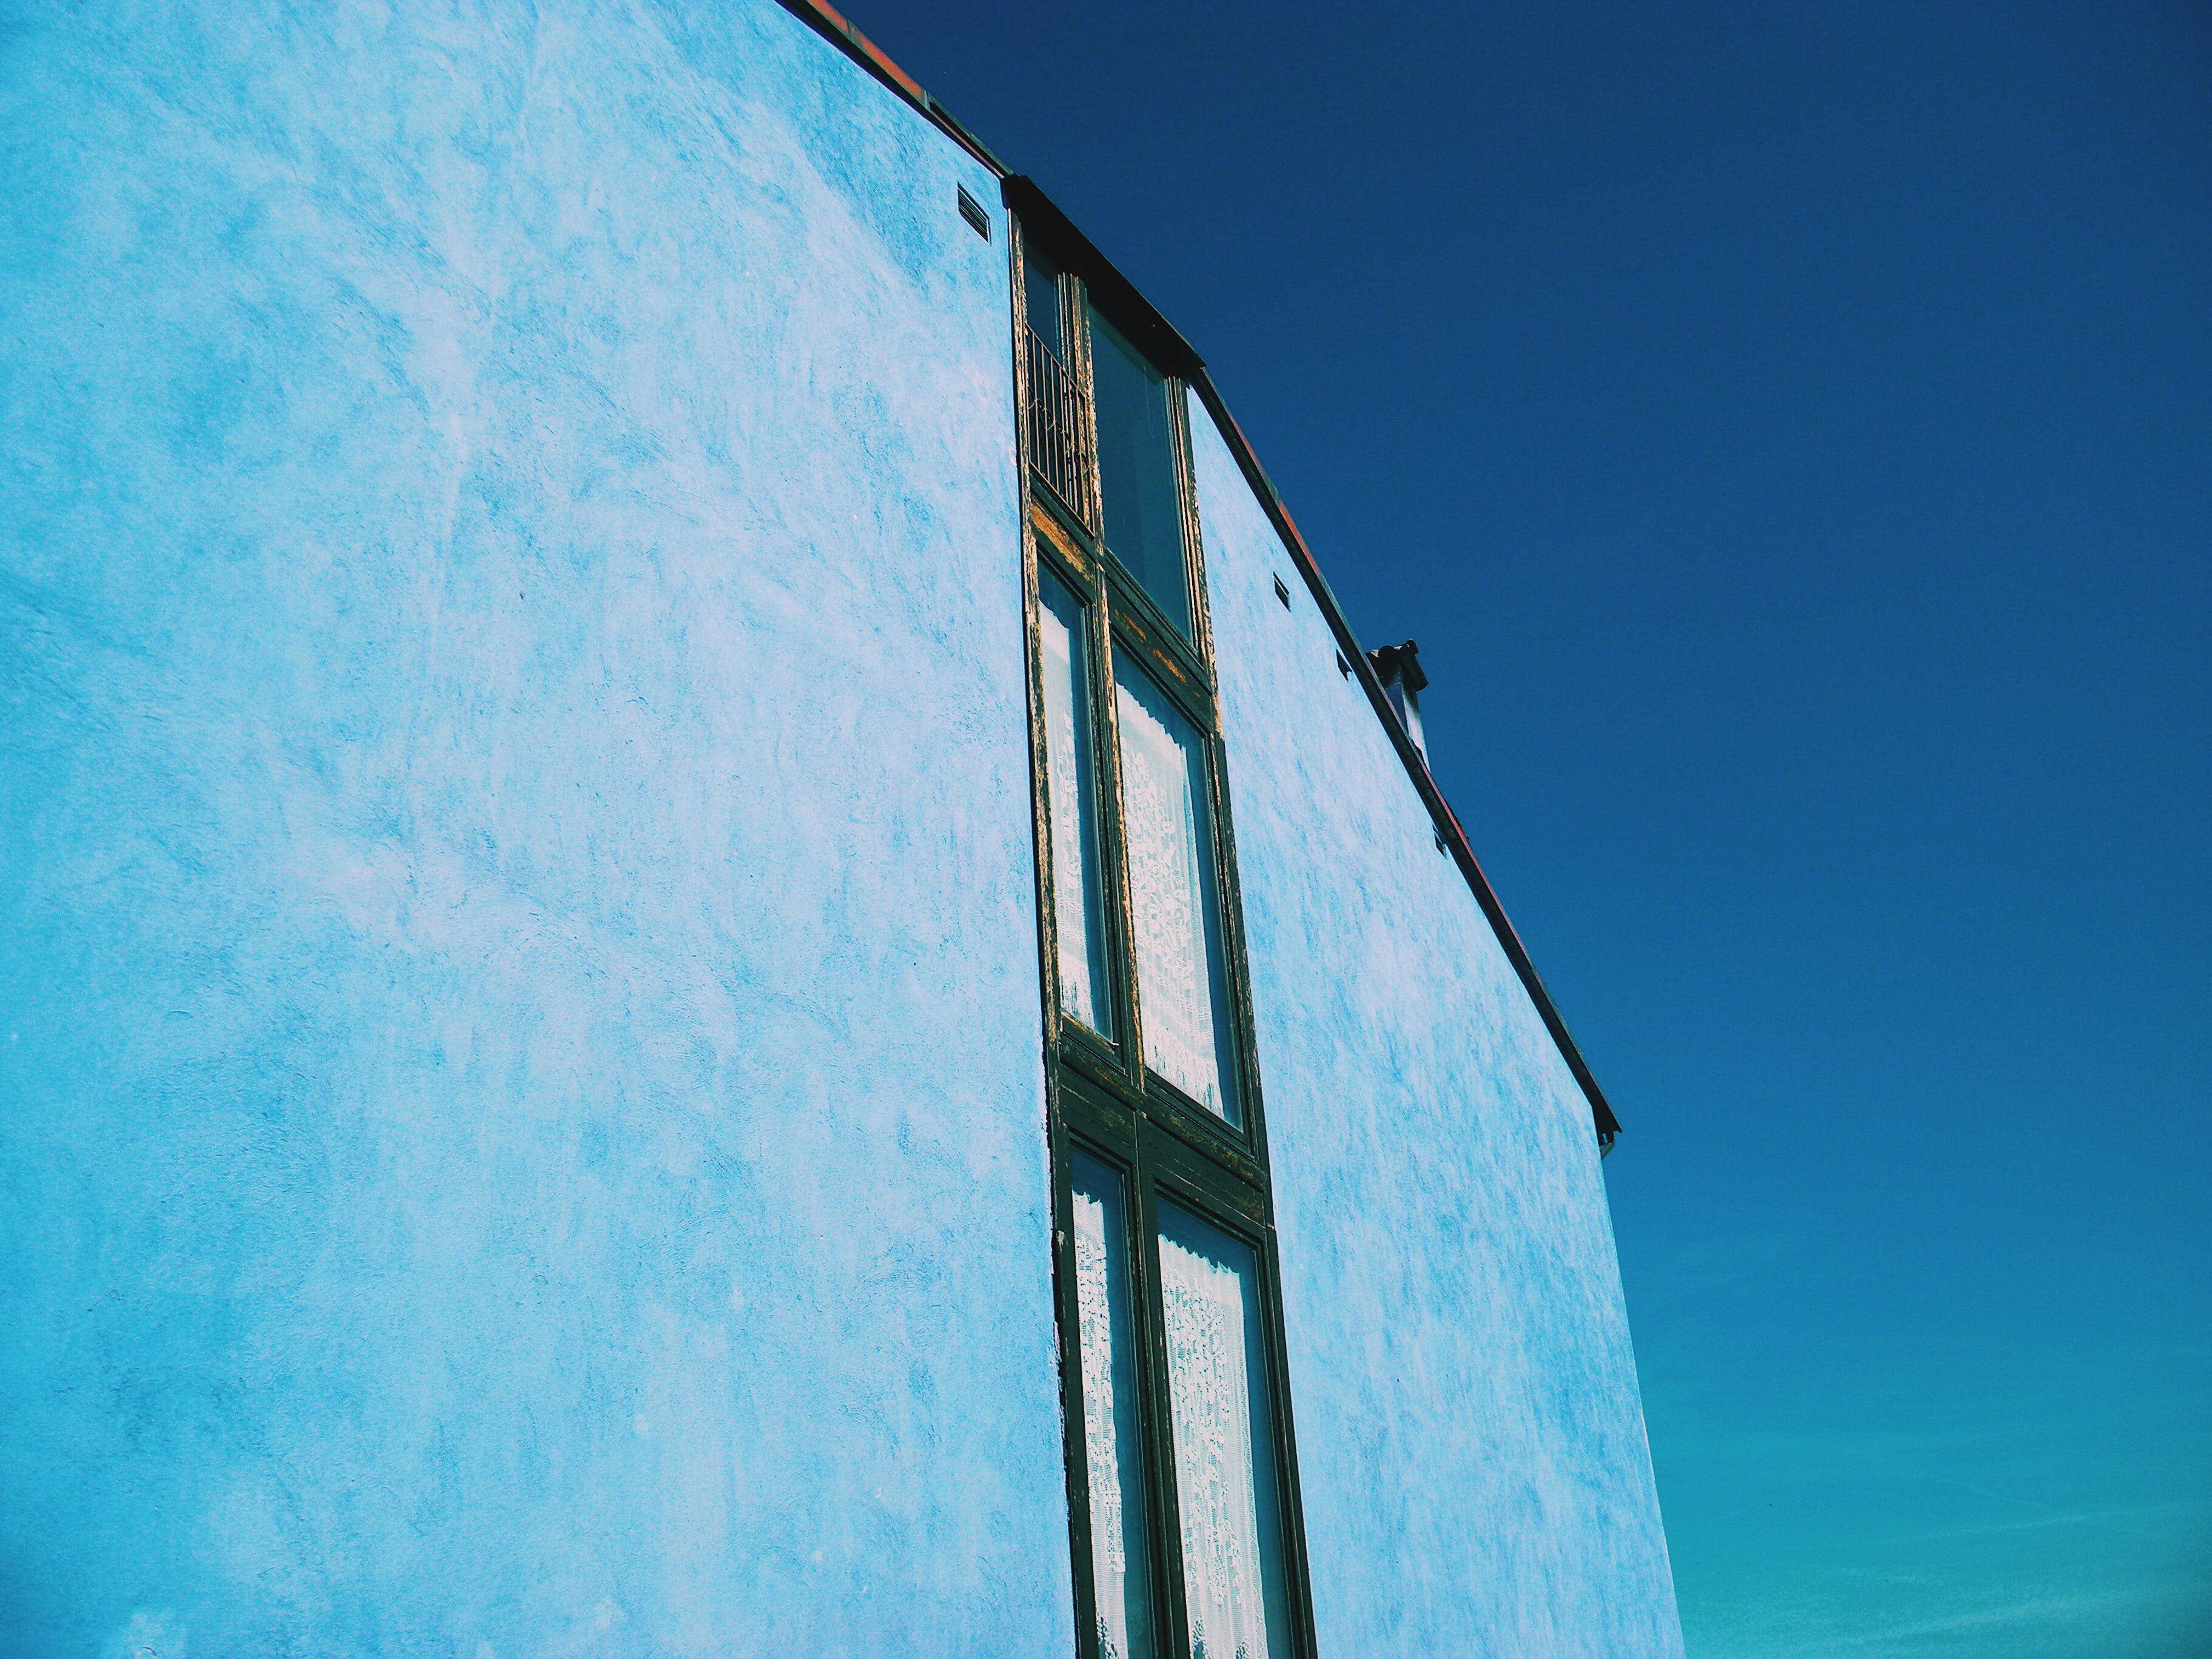 Free stock photo of blue, blue skies, blue sky, building